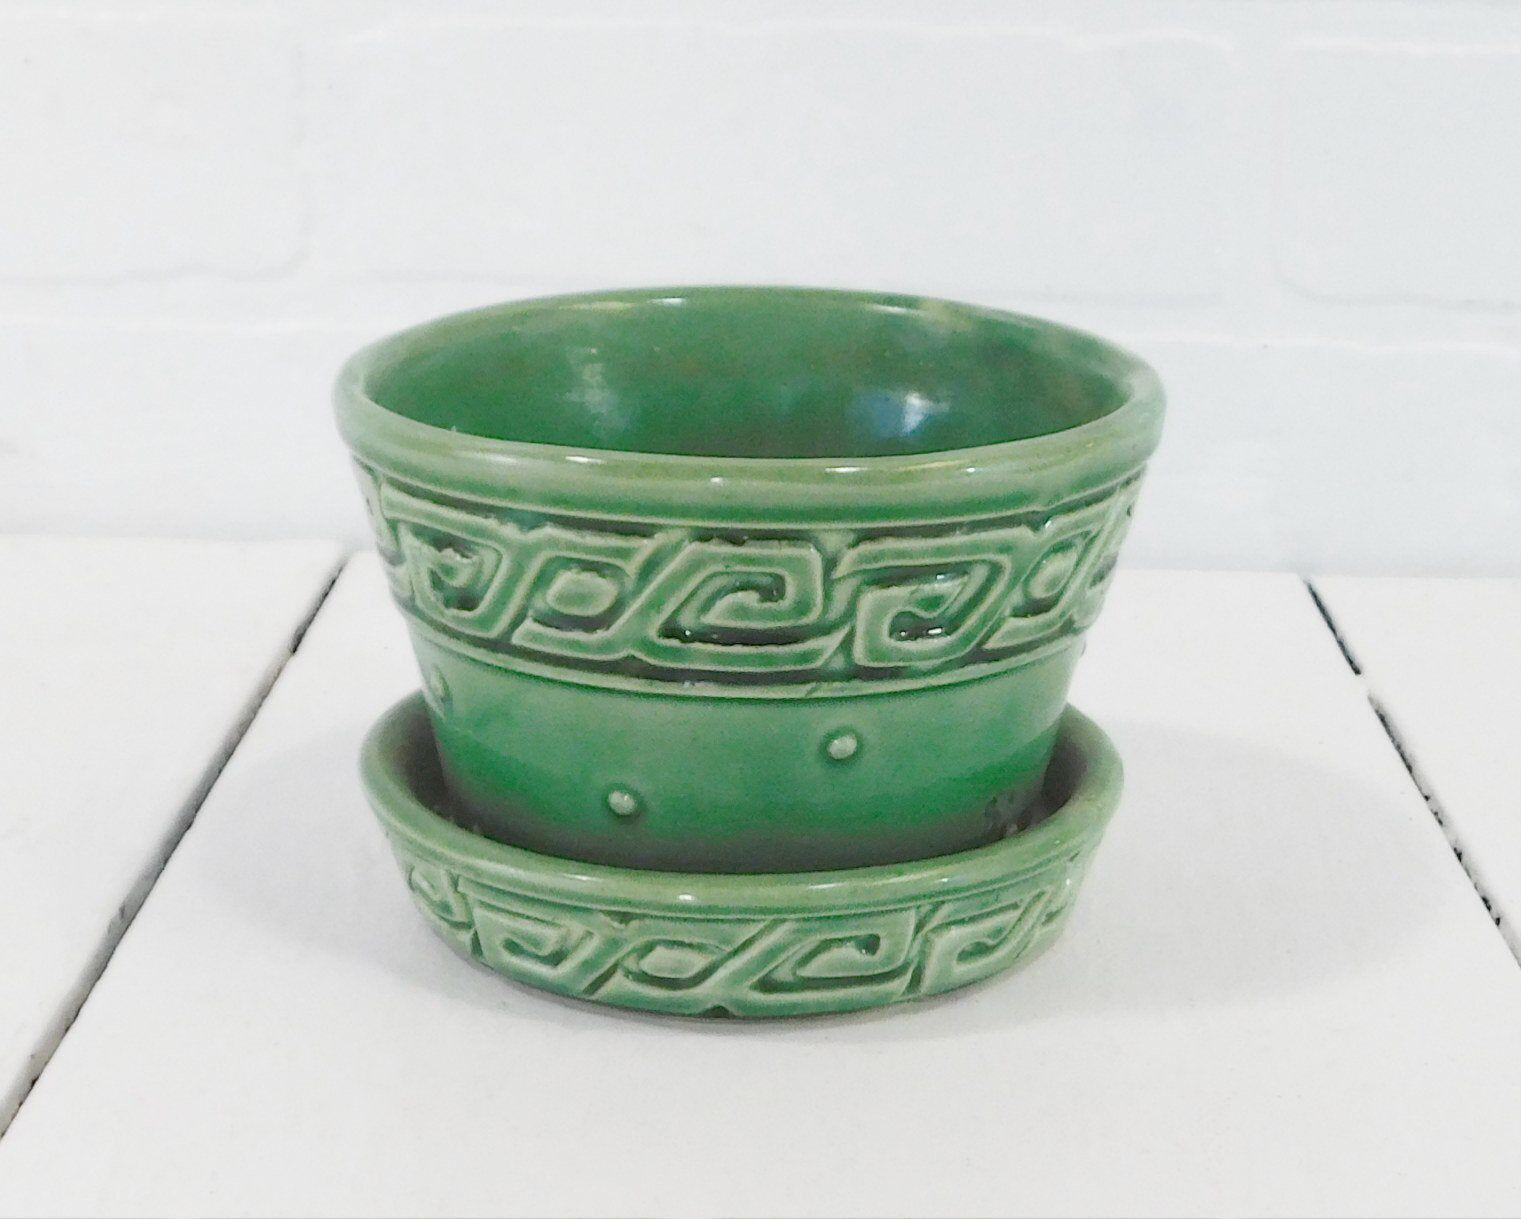 Vintage Mccoy Pottery Green Flower Pot With Attached Saucer Mccoy Greek Key Planter 1950s Mccoy Pottery Pv261 In 2020 Green Flower Pots Mccoy Pottery Flower Pots